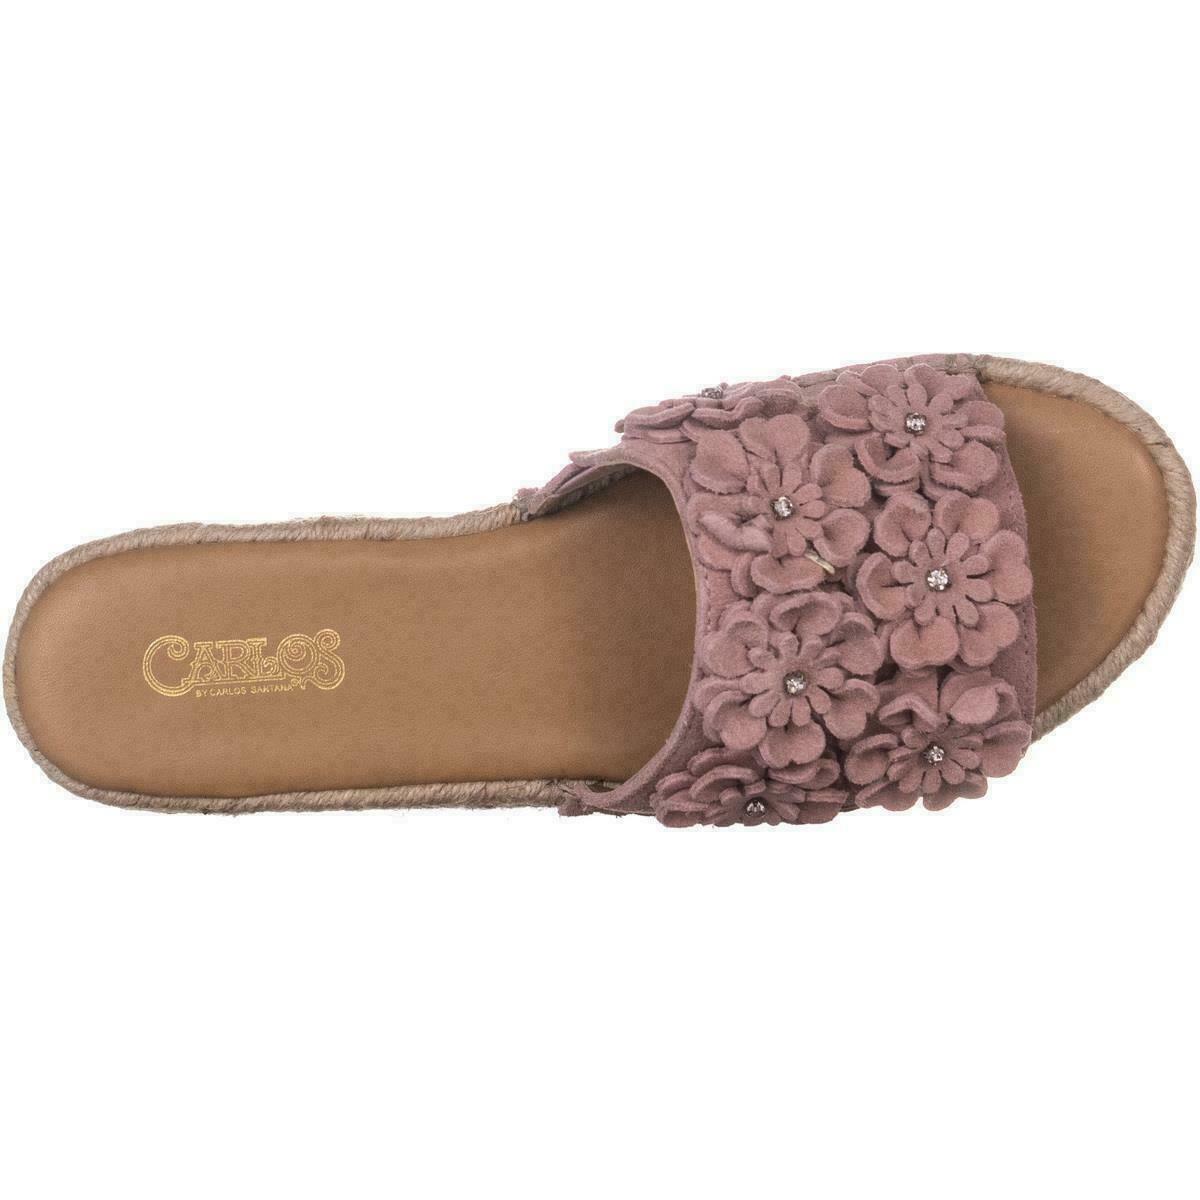 Carlos by Carlos Santana Chandler Sandals Pink Blush, Size 5.5 M